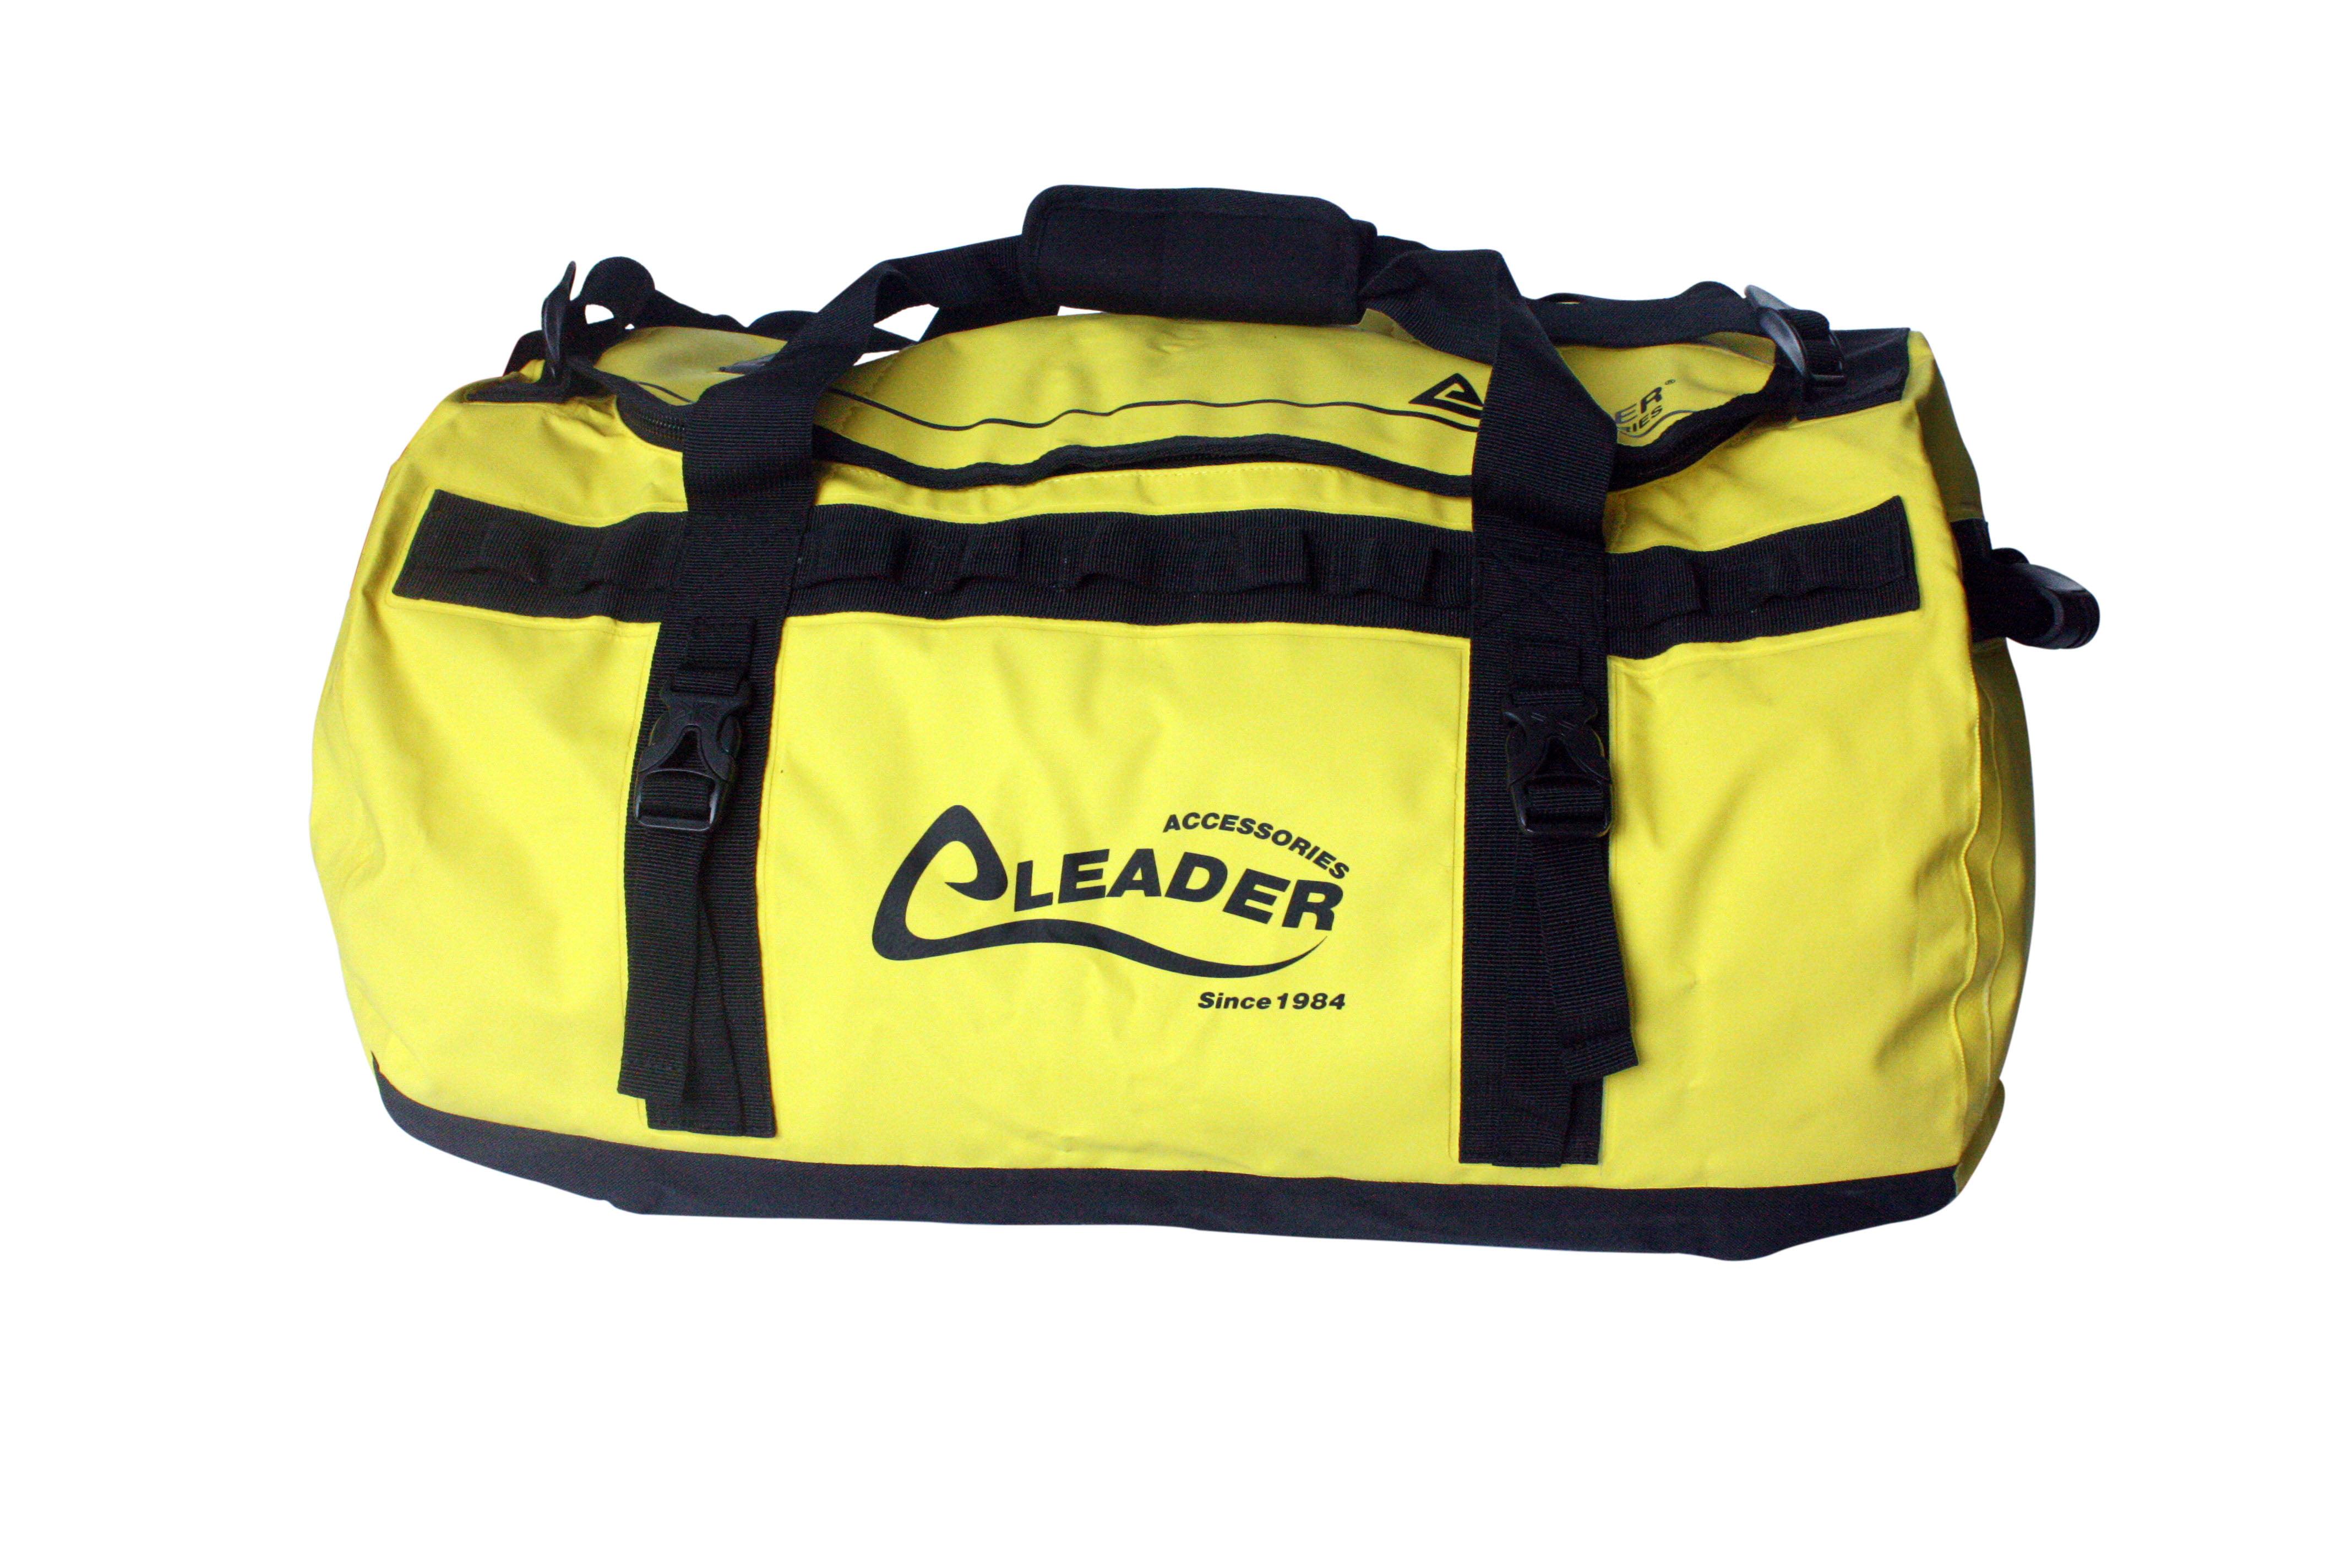 Leader Accessories Deluxe Waterproof PVC Tarpaulin Duffel Bag Backpack Dry  Bag 40l 70l 90l - Walmart.com 33125174c5372